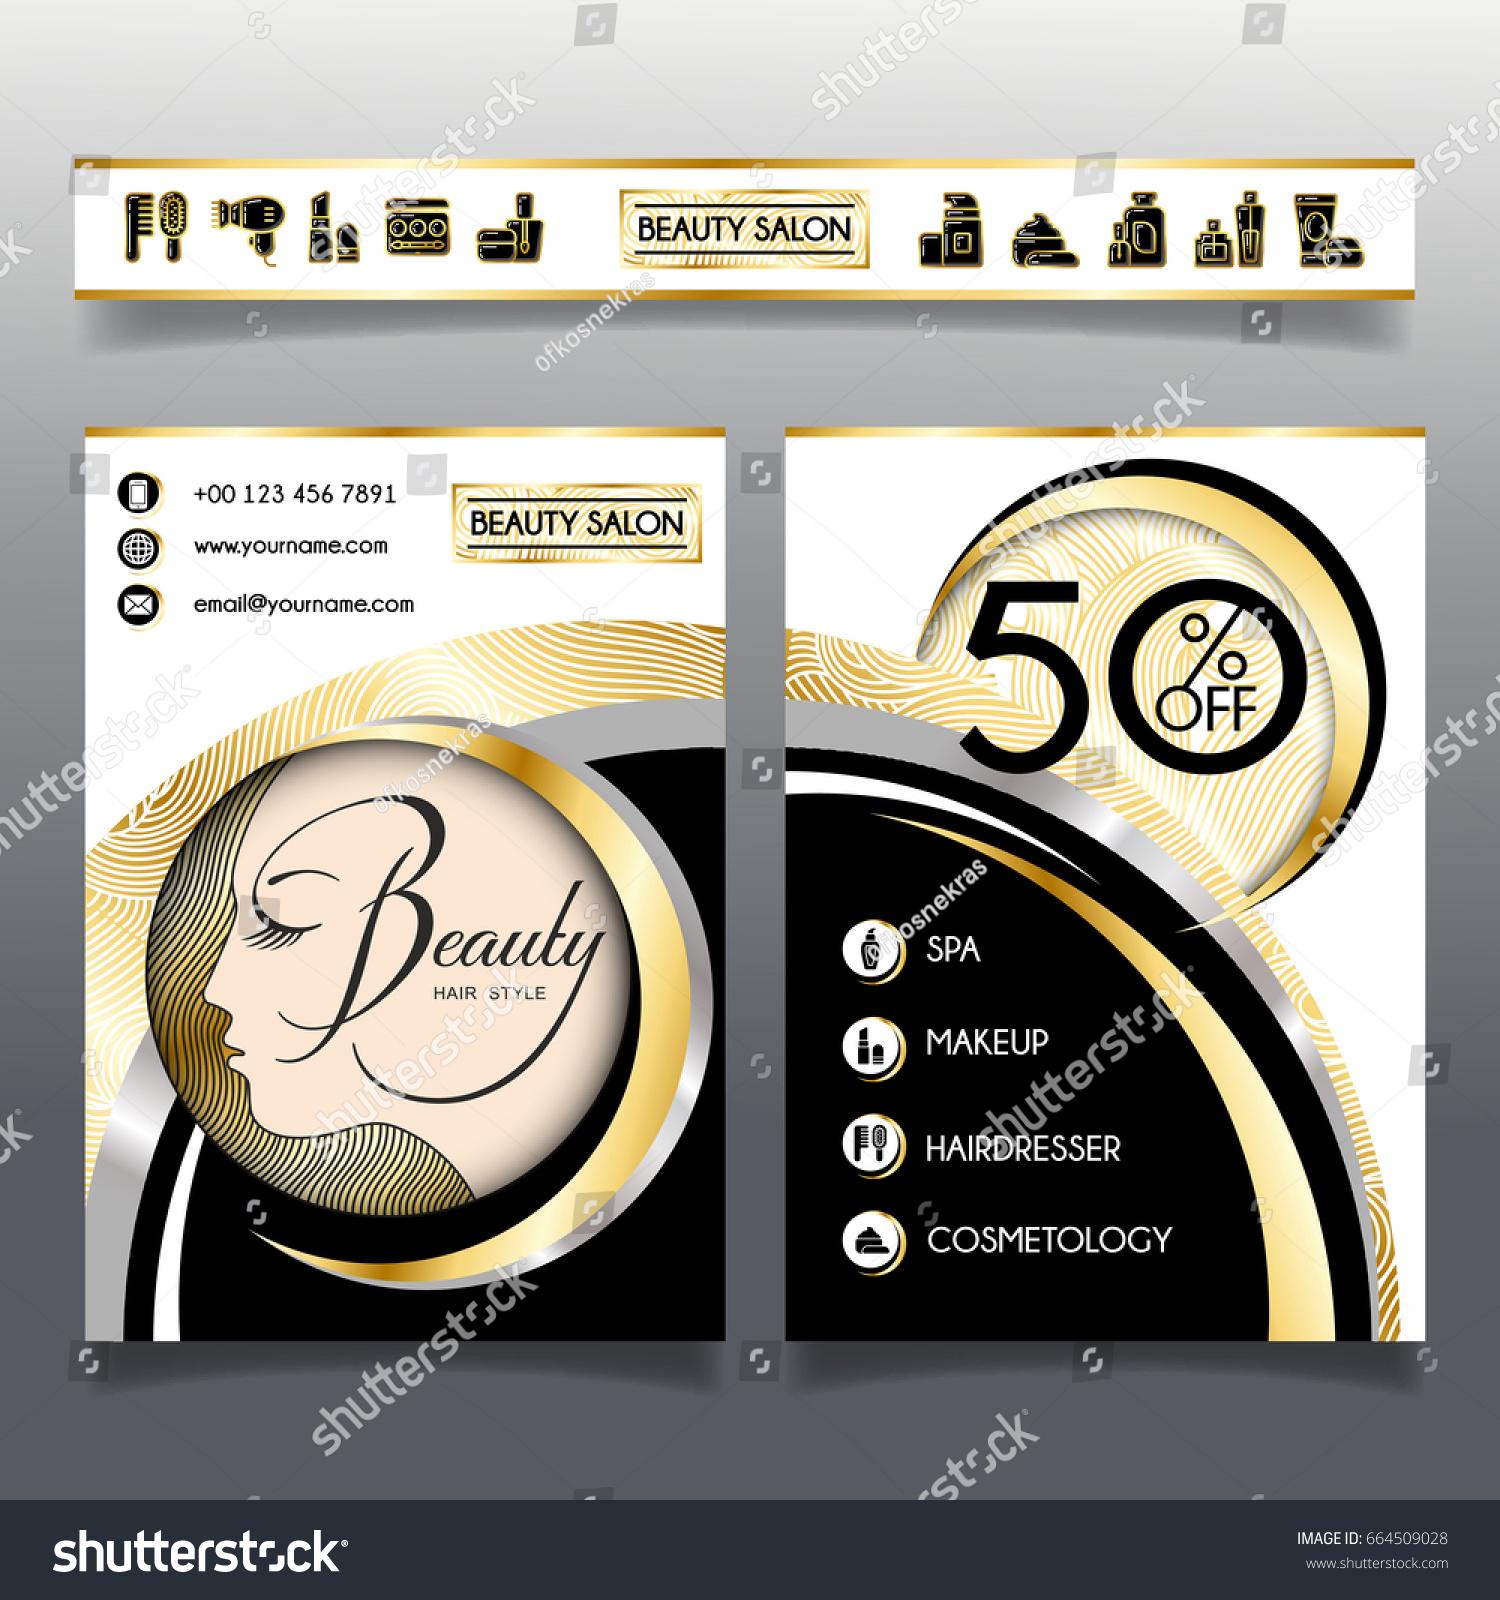 Business Brochure Template Beauty Salon Hairdressing Stock Vector